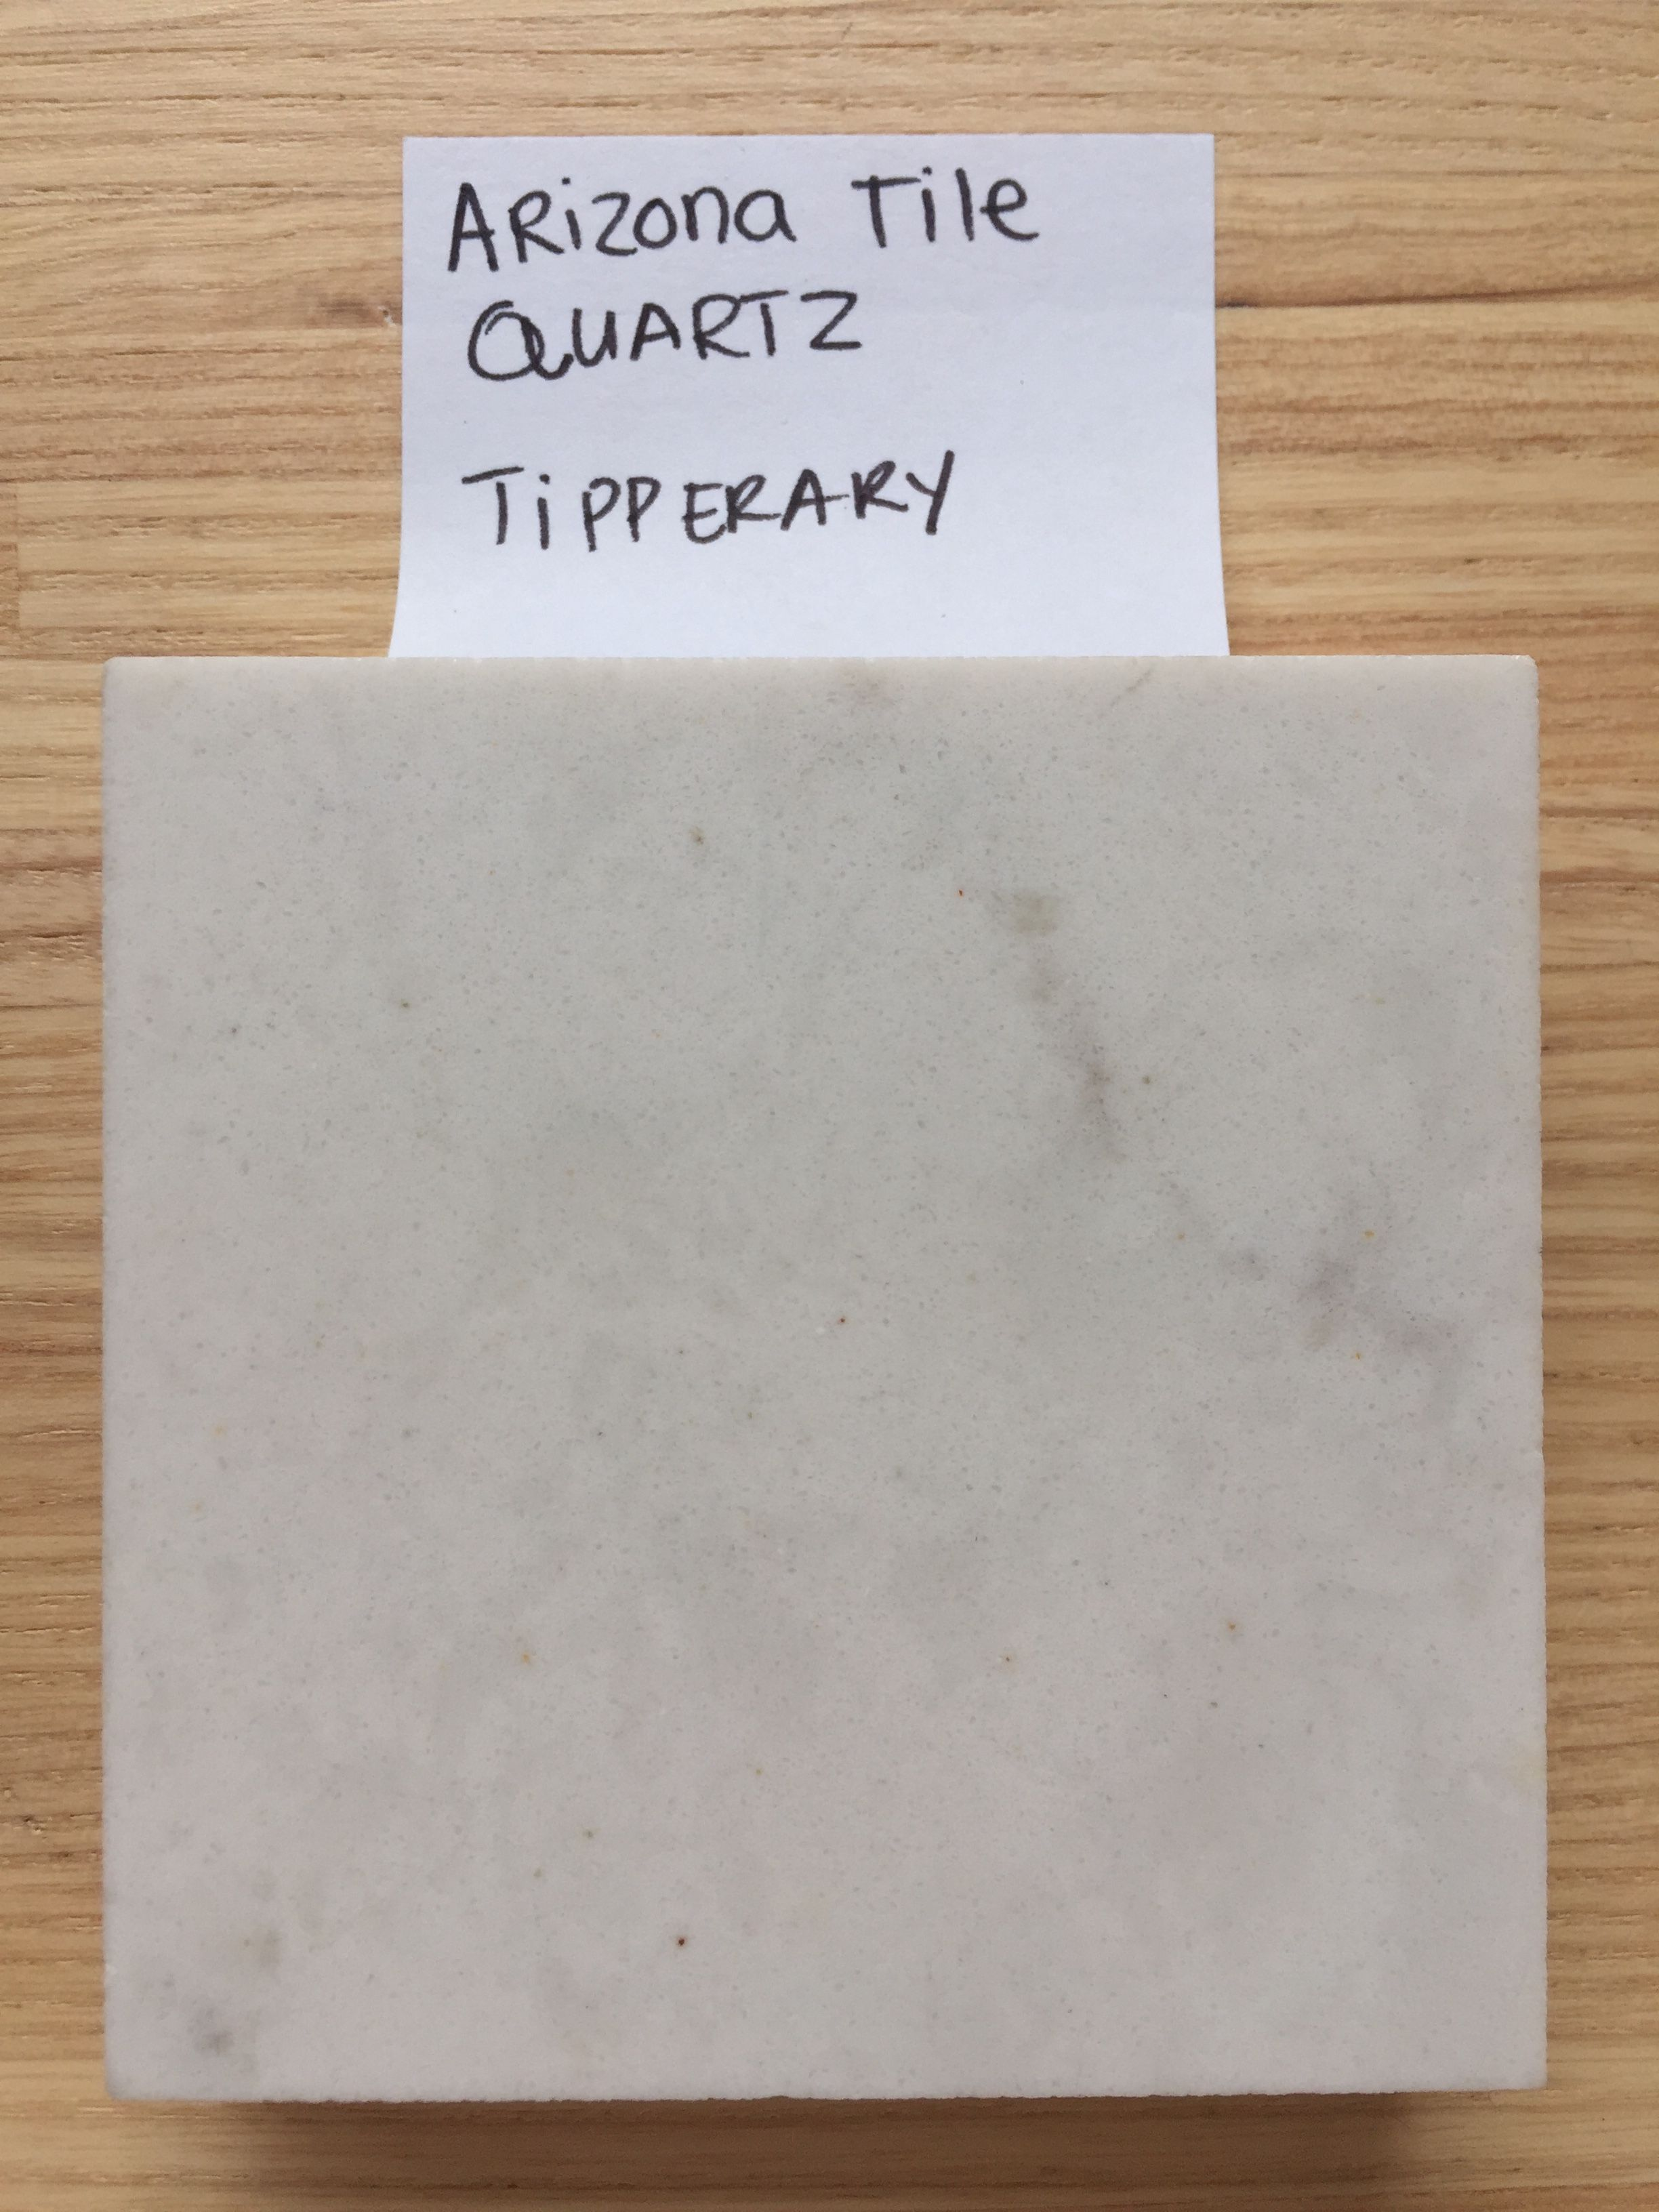 Arizona Tile Quartz Countertop In Tipperary Quartz Countertops Tiles Slab